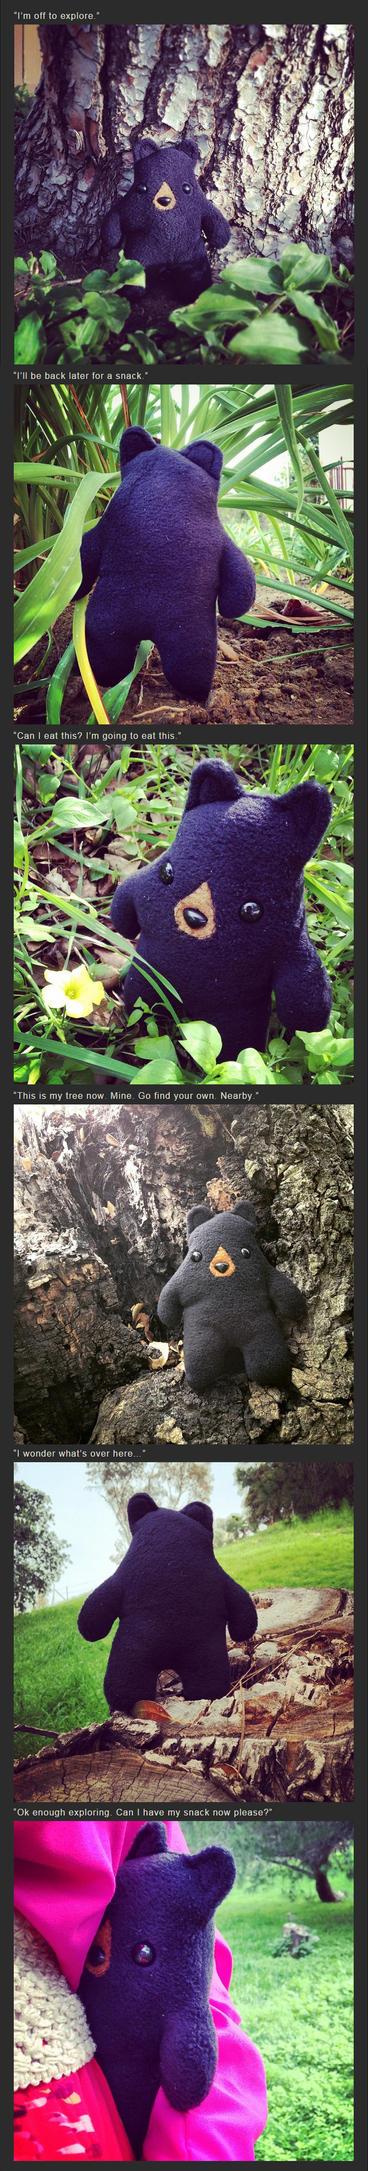 Bold Black Bear's Adventure by csgirl